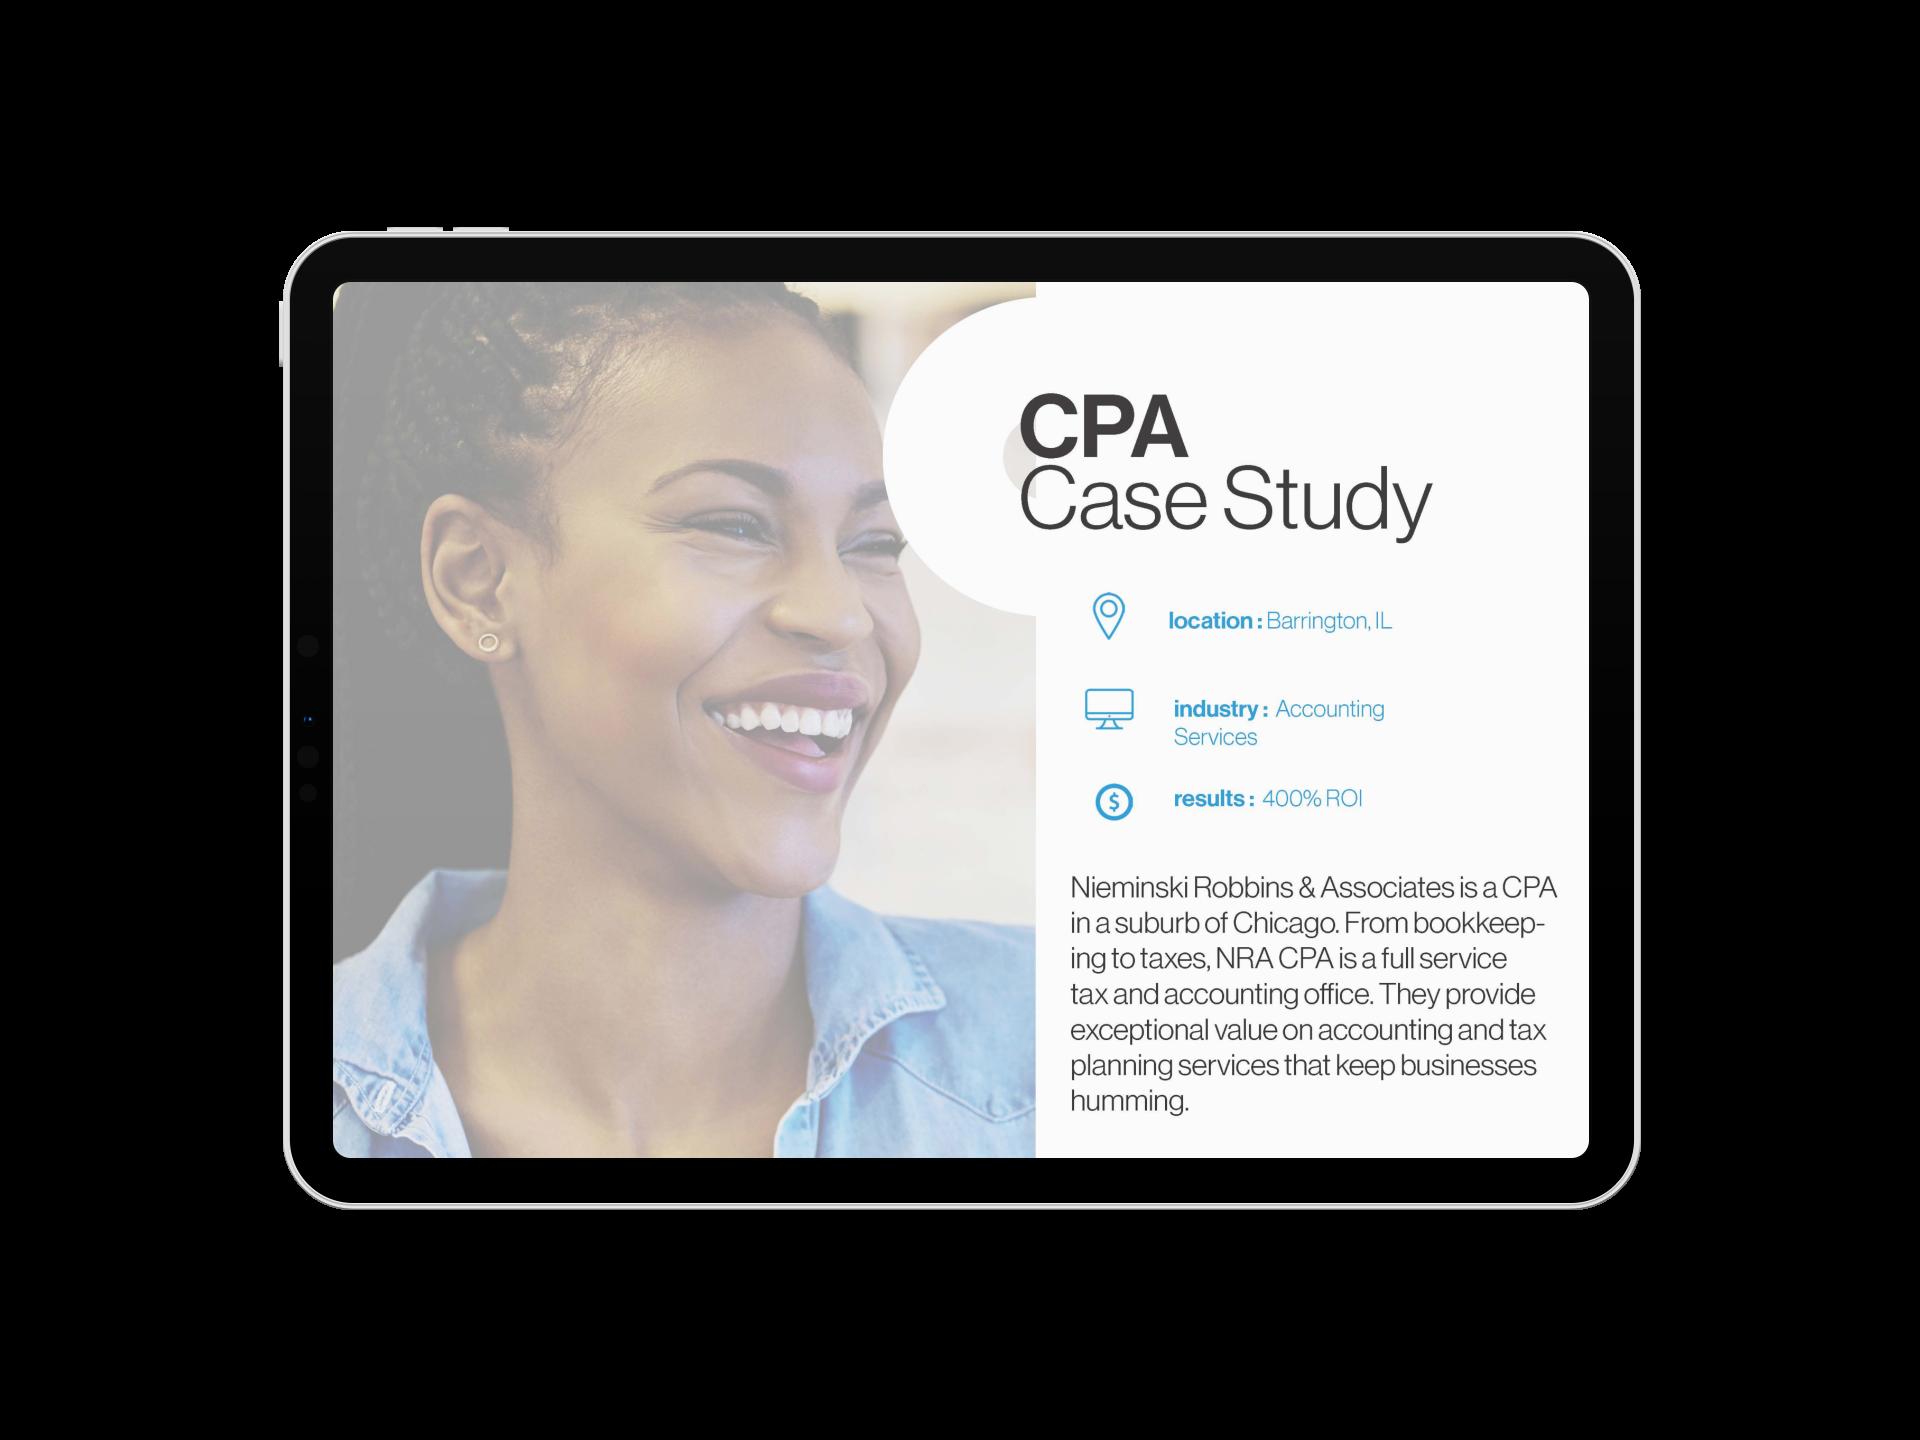 CPA Case Study